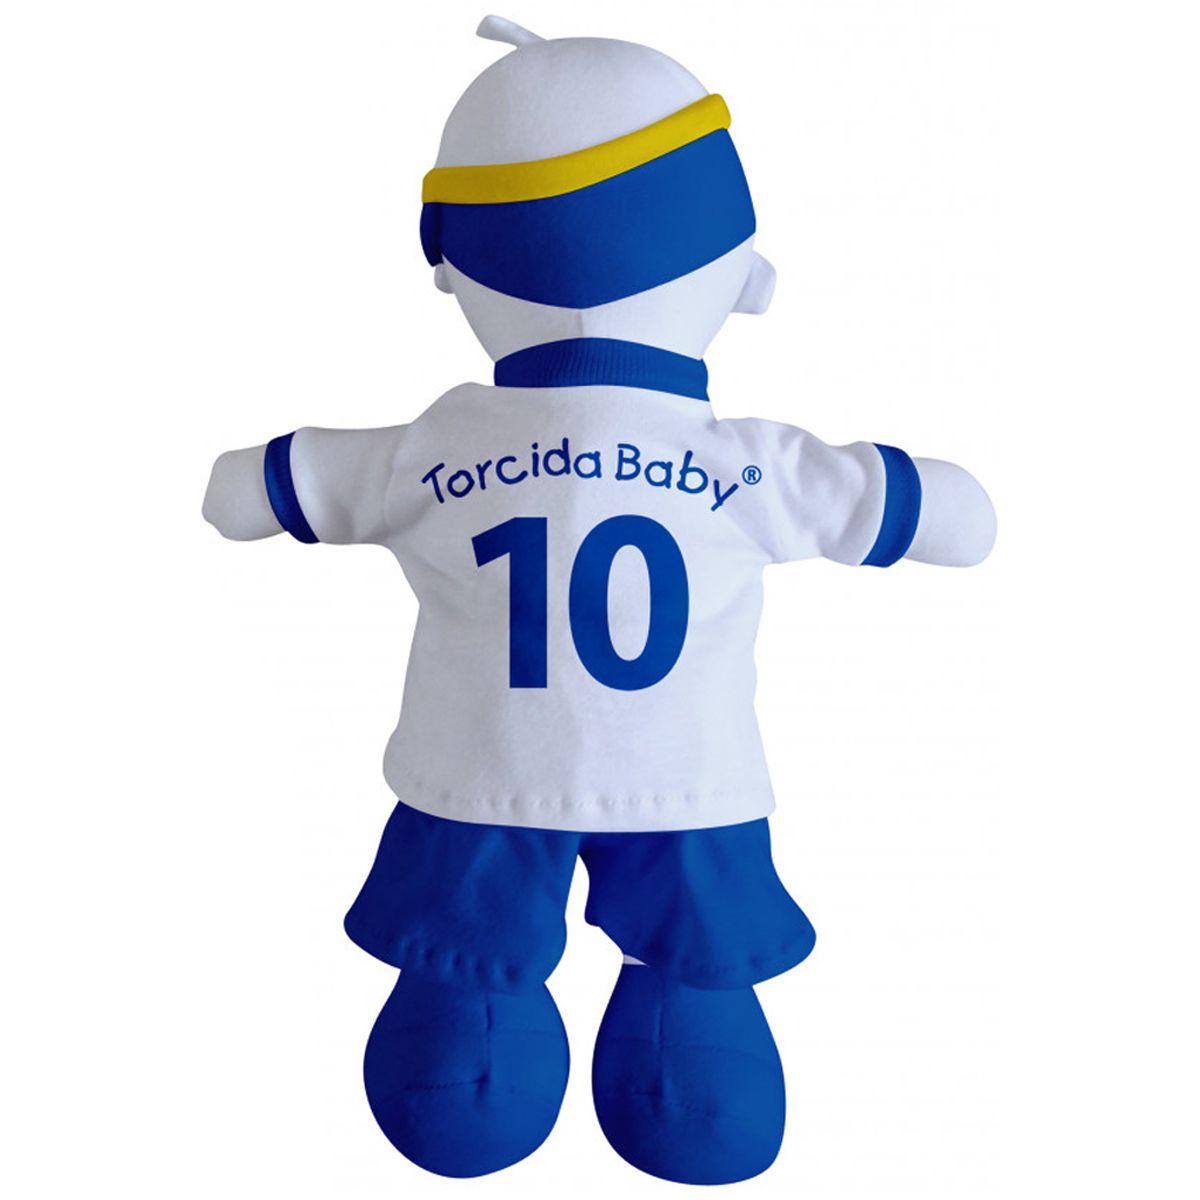 Boneco Mascote do Cruzeiro - Torcida Baby 238A